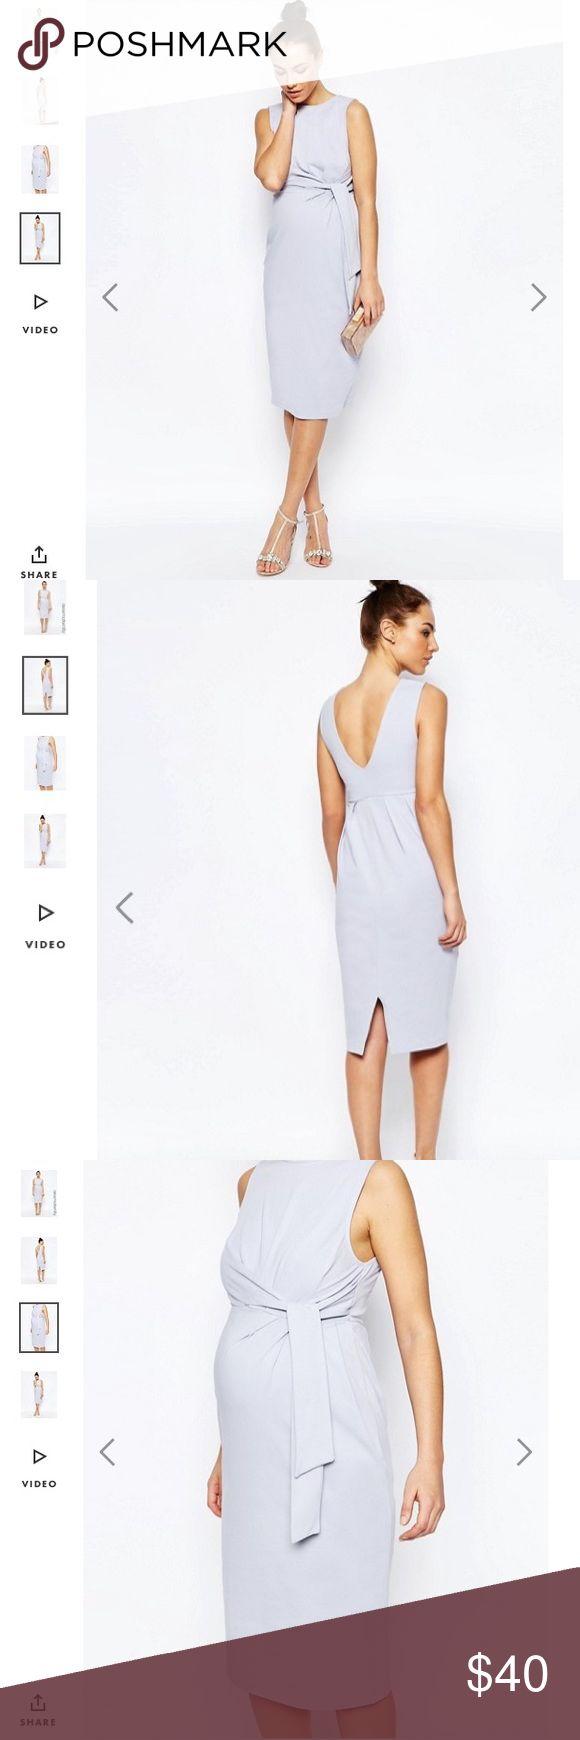 Sale NWT Asos maternity lilac color dress 6 Beautiful Asos maternity dress size 6. Super comfy . ASOS Maternity Dresses